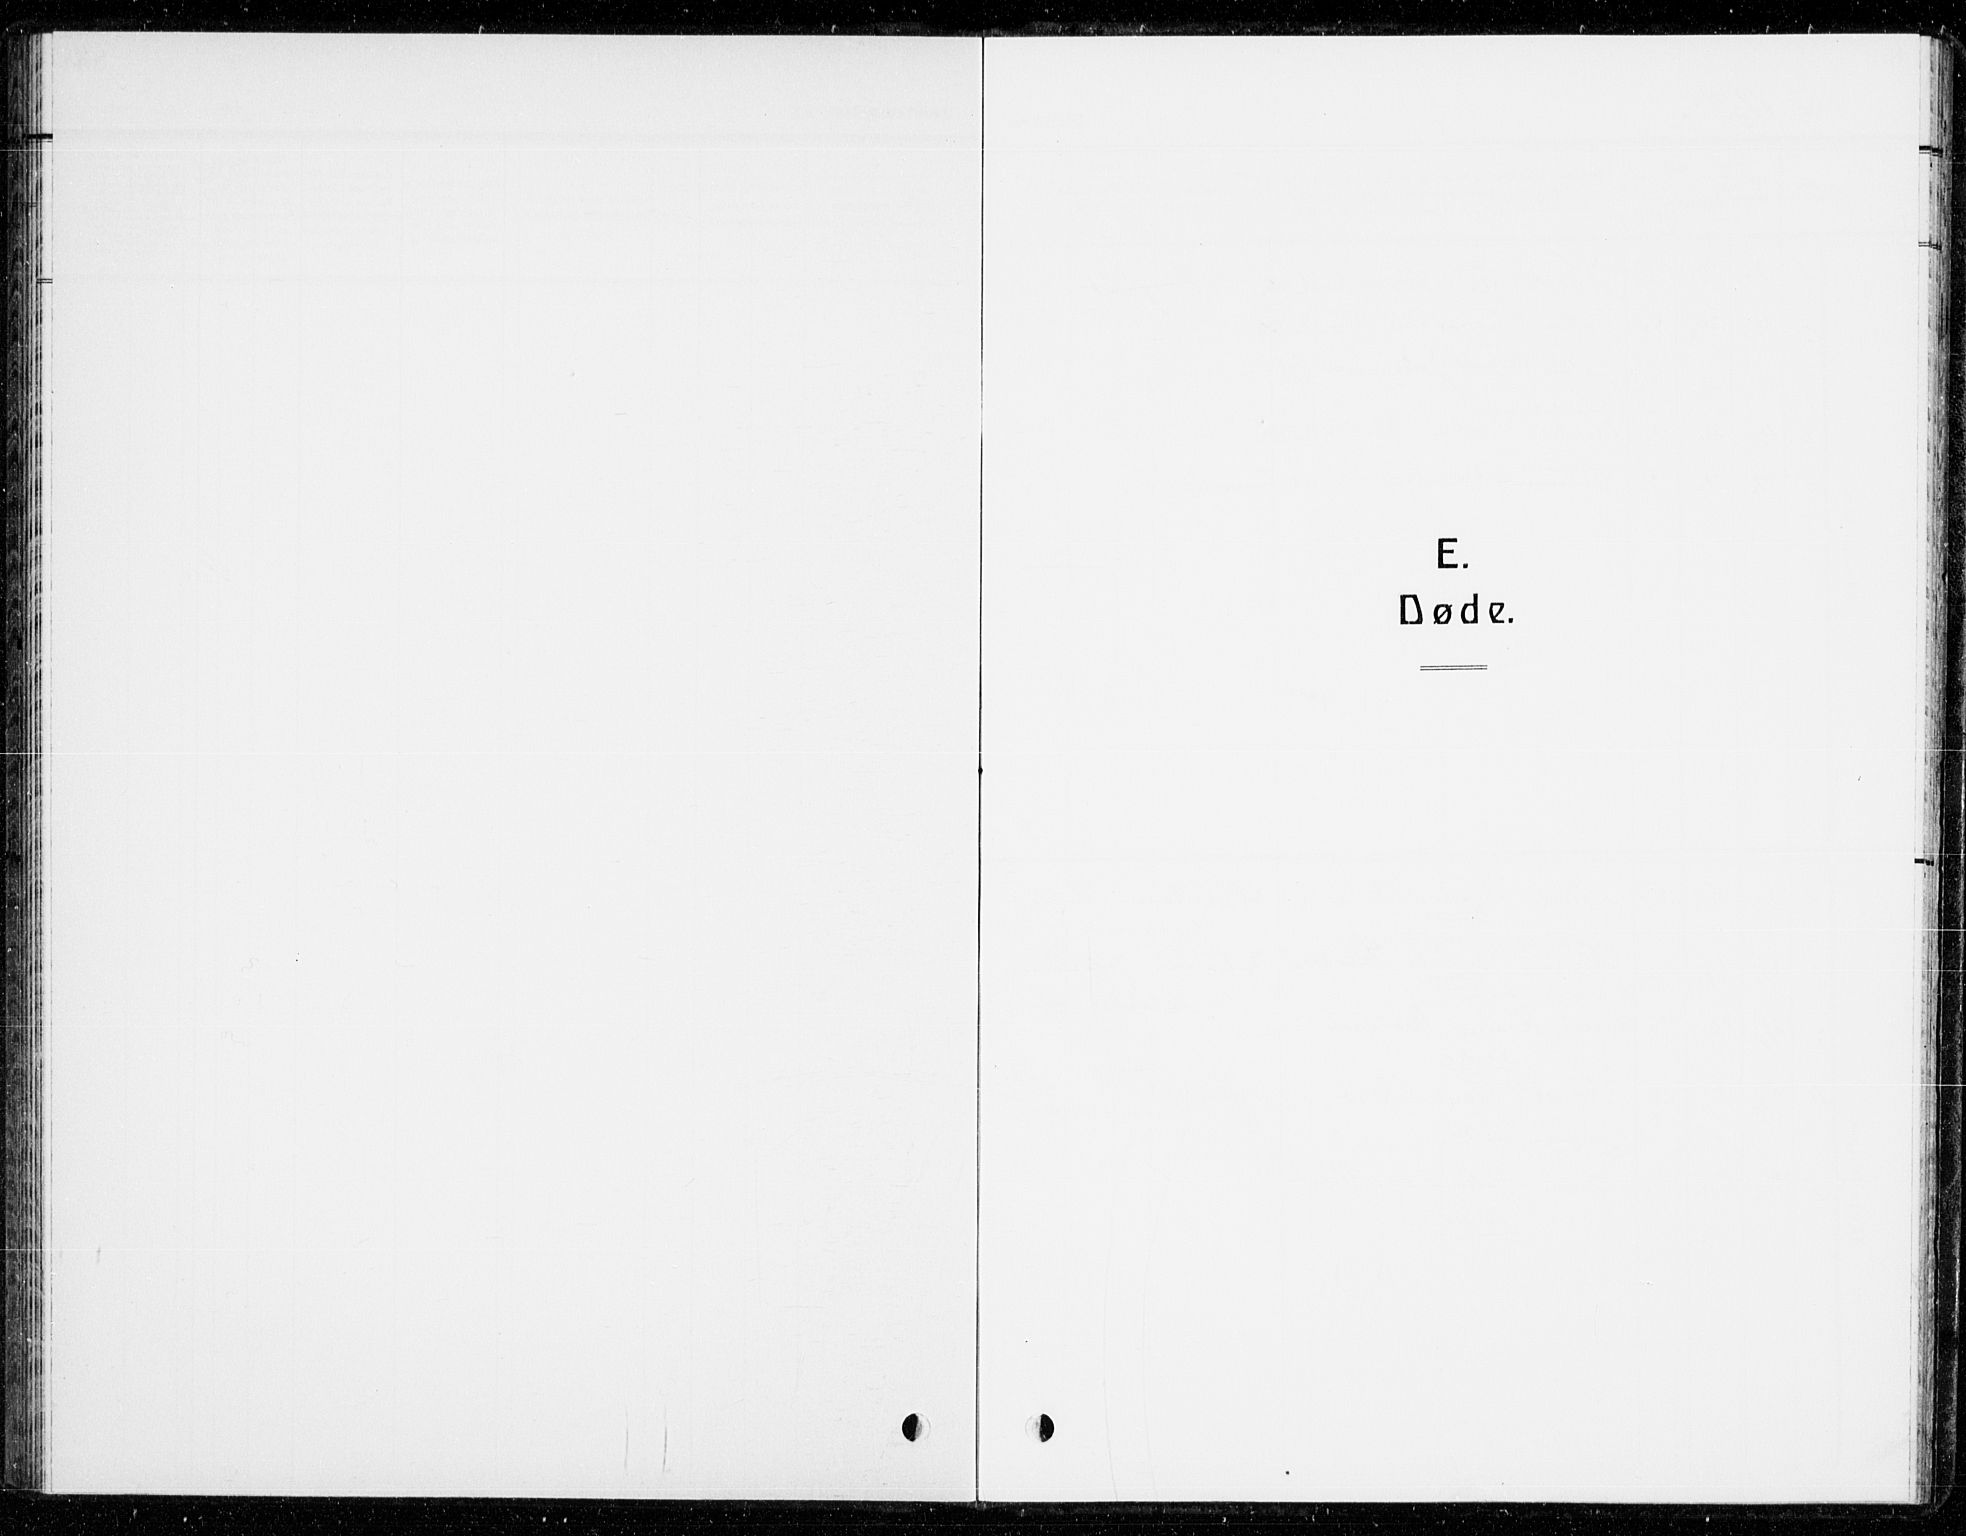 SAKO, Holla kirkebøker, G/Gb/L0003: Klokkerbok nr. II 3, 1914-1941